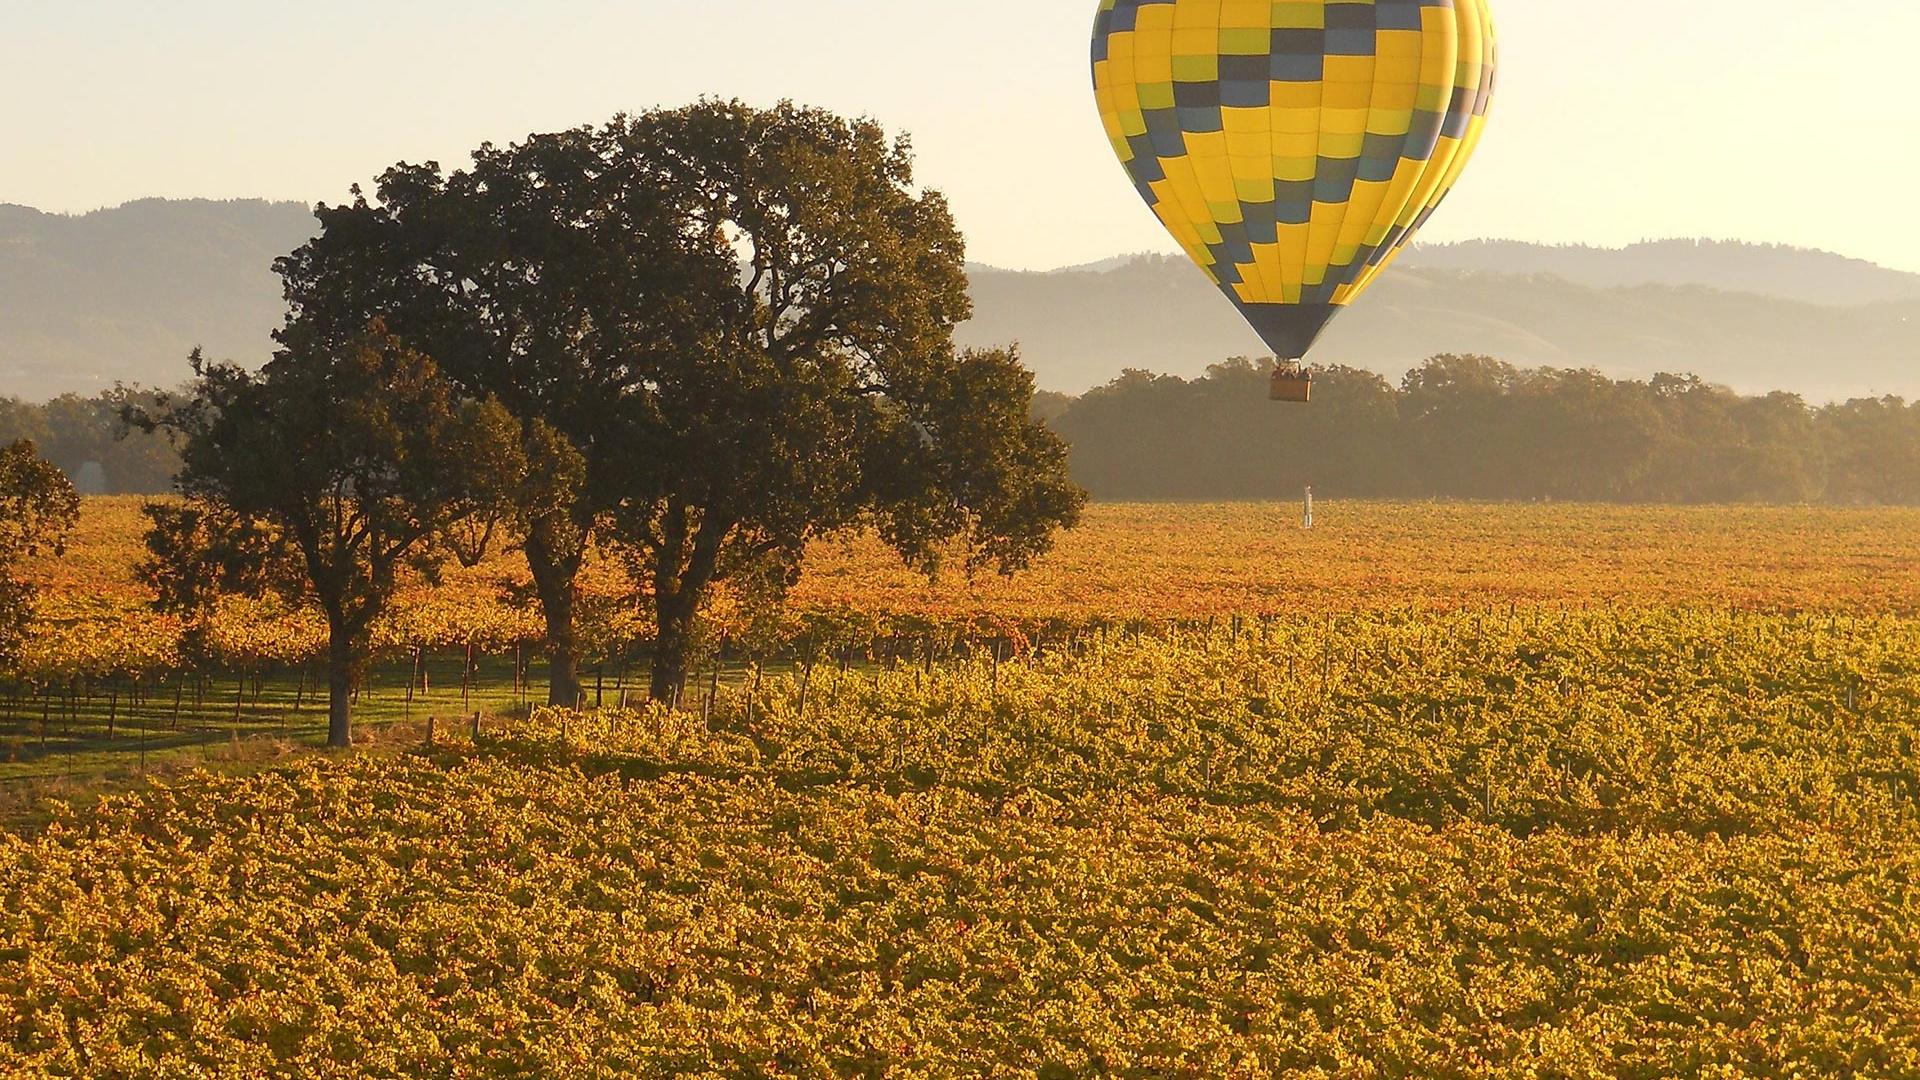 Hot air balloon in Sonoma County, California